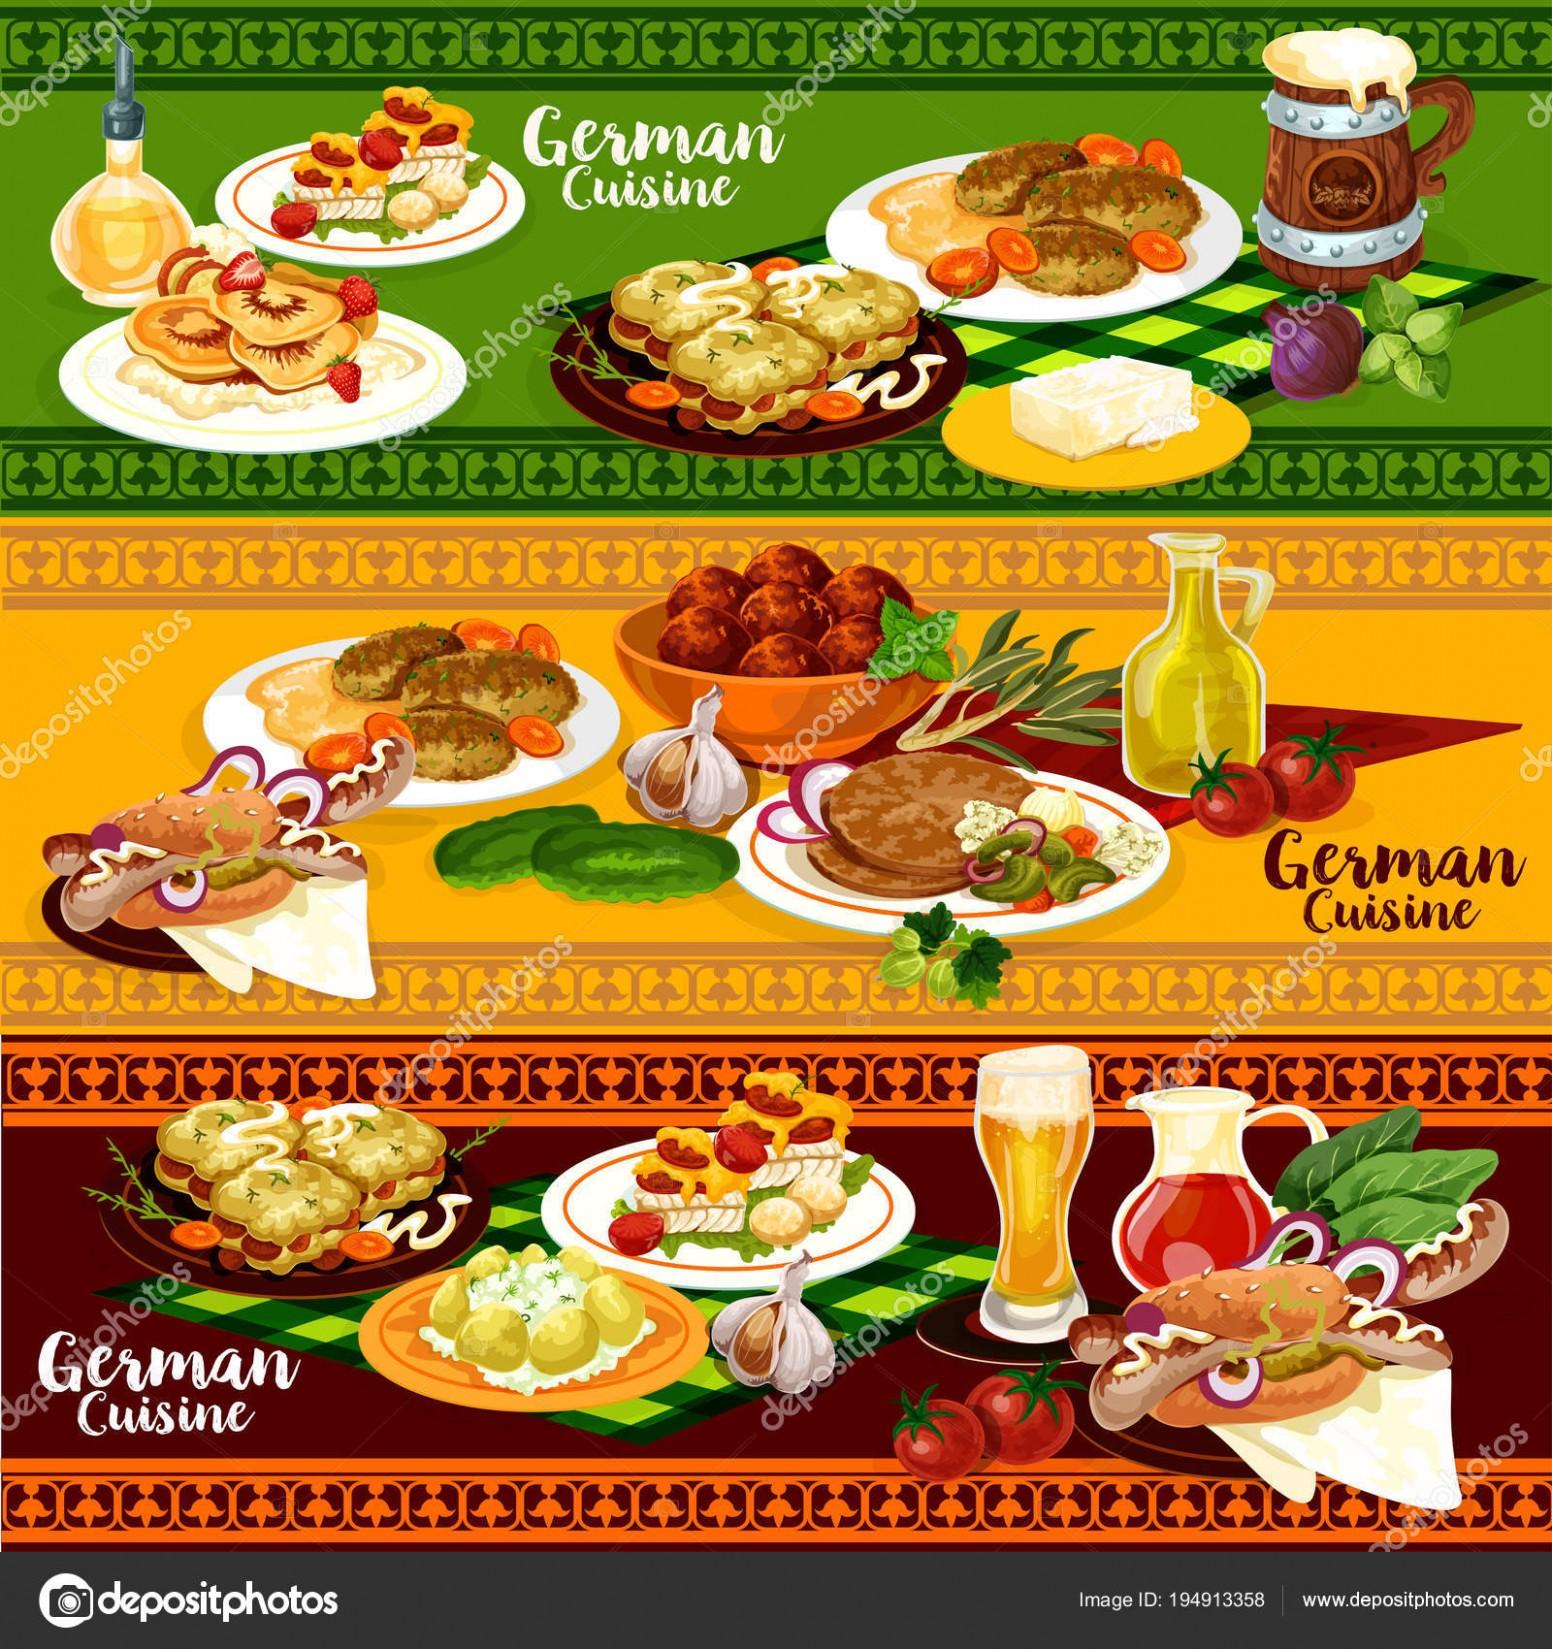 Kuchyne z Nemecka